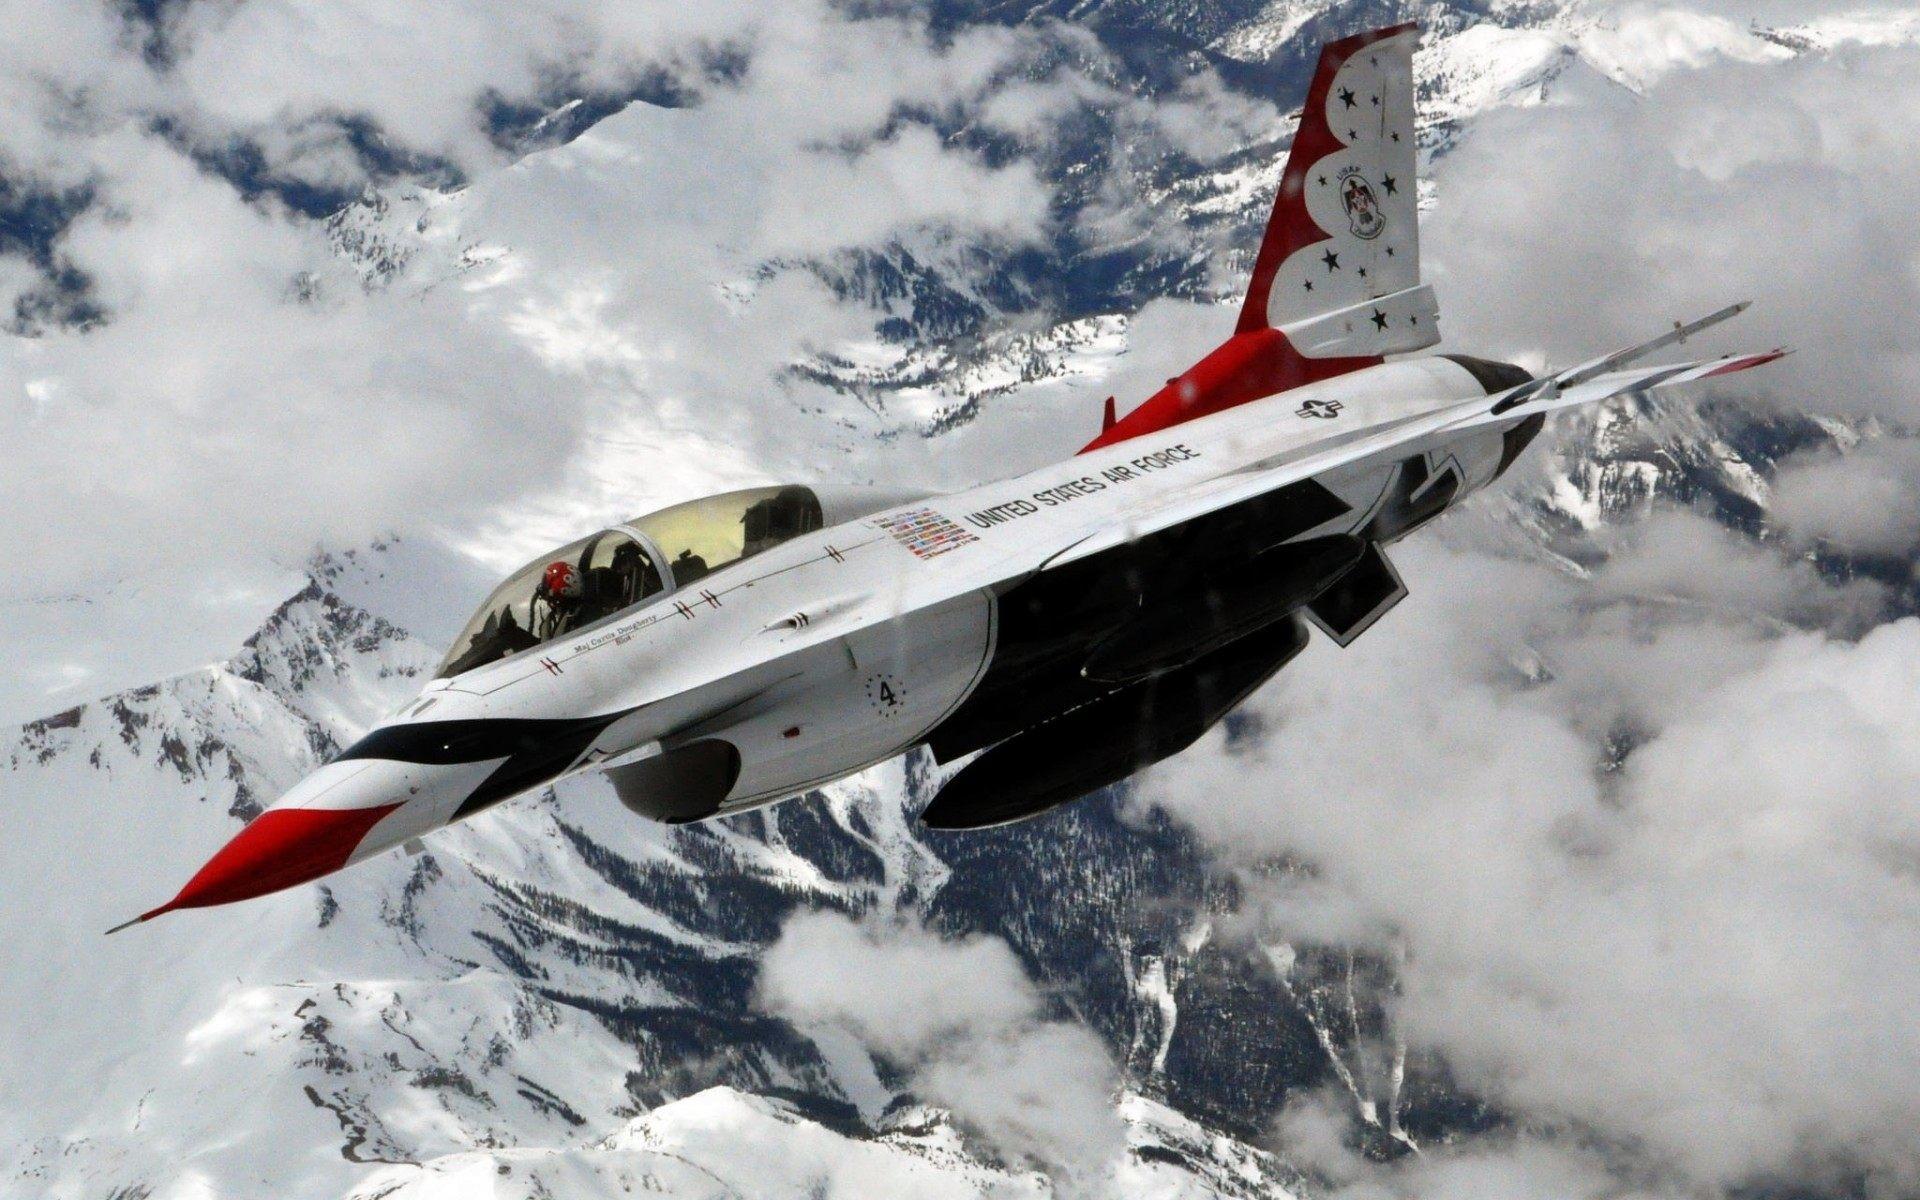 f 16 fighter jet wallpapers desktop background for desktop wallpaper  background on airplane category similar with